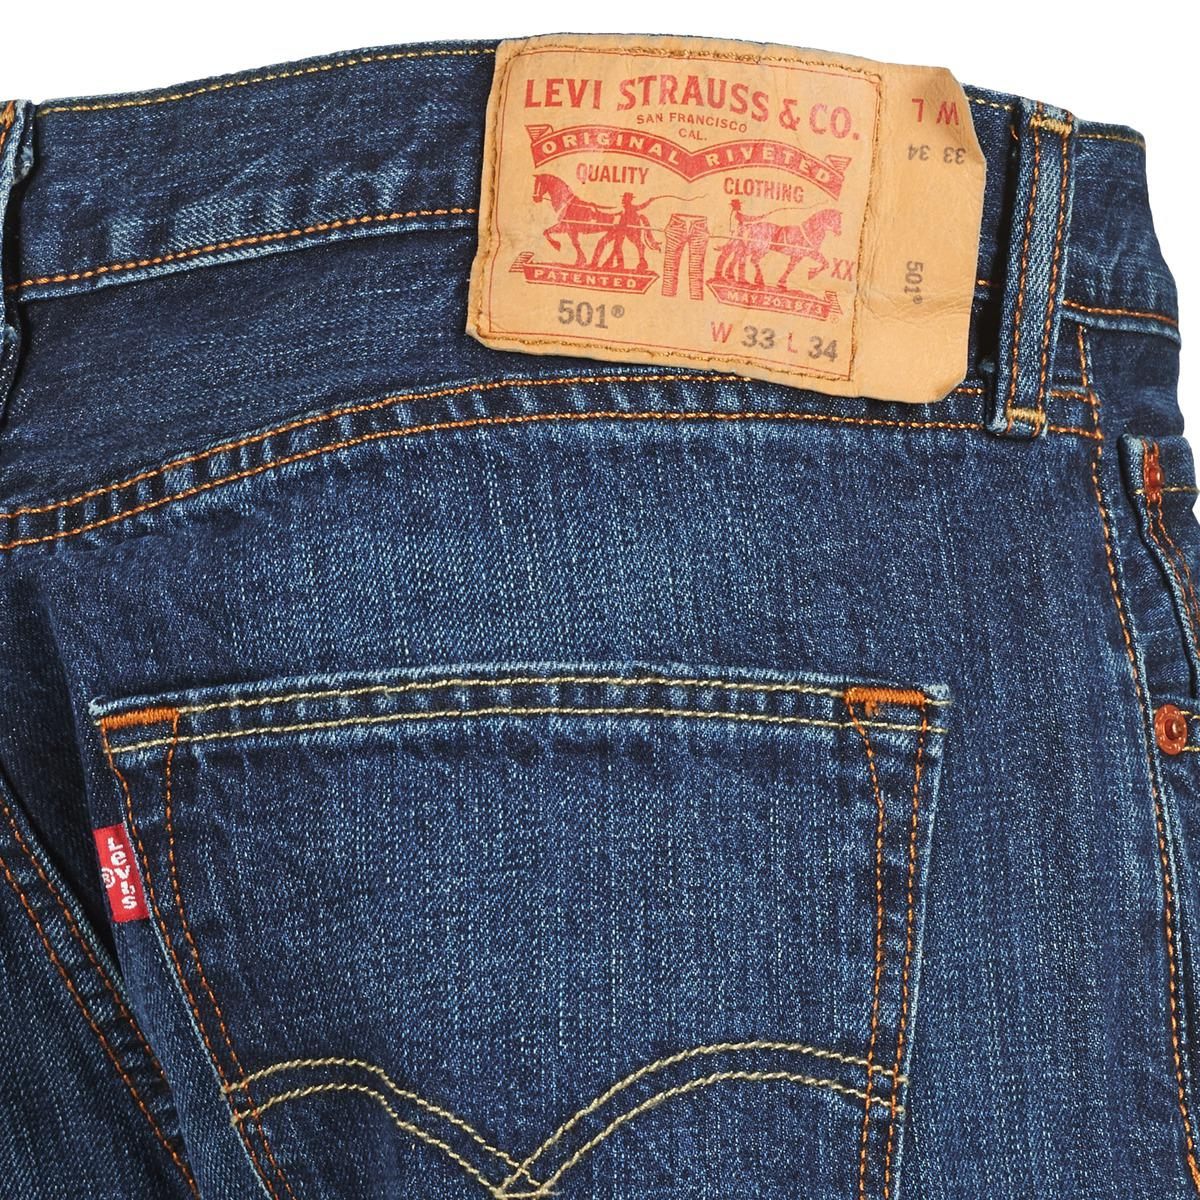 Levi's Denim 501 Jeans in Blue for Men